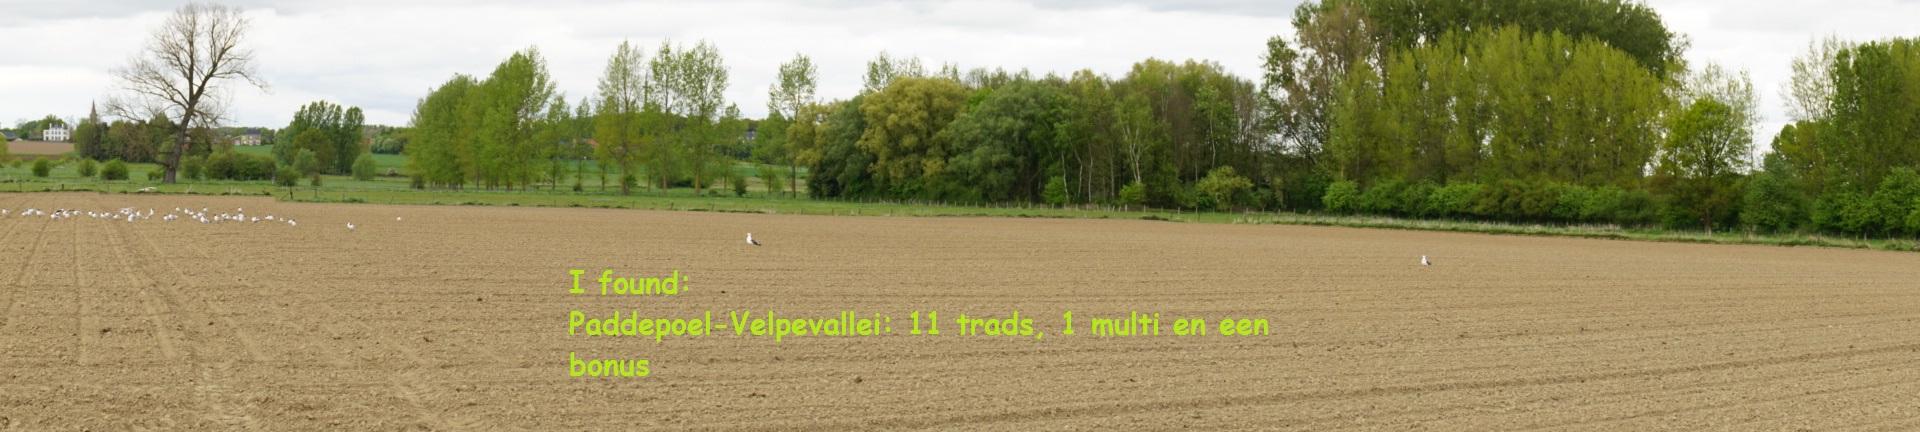 Paddepoel-Velpevallei